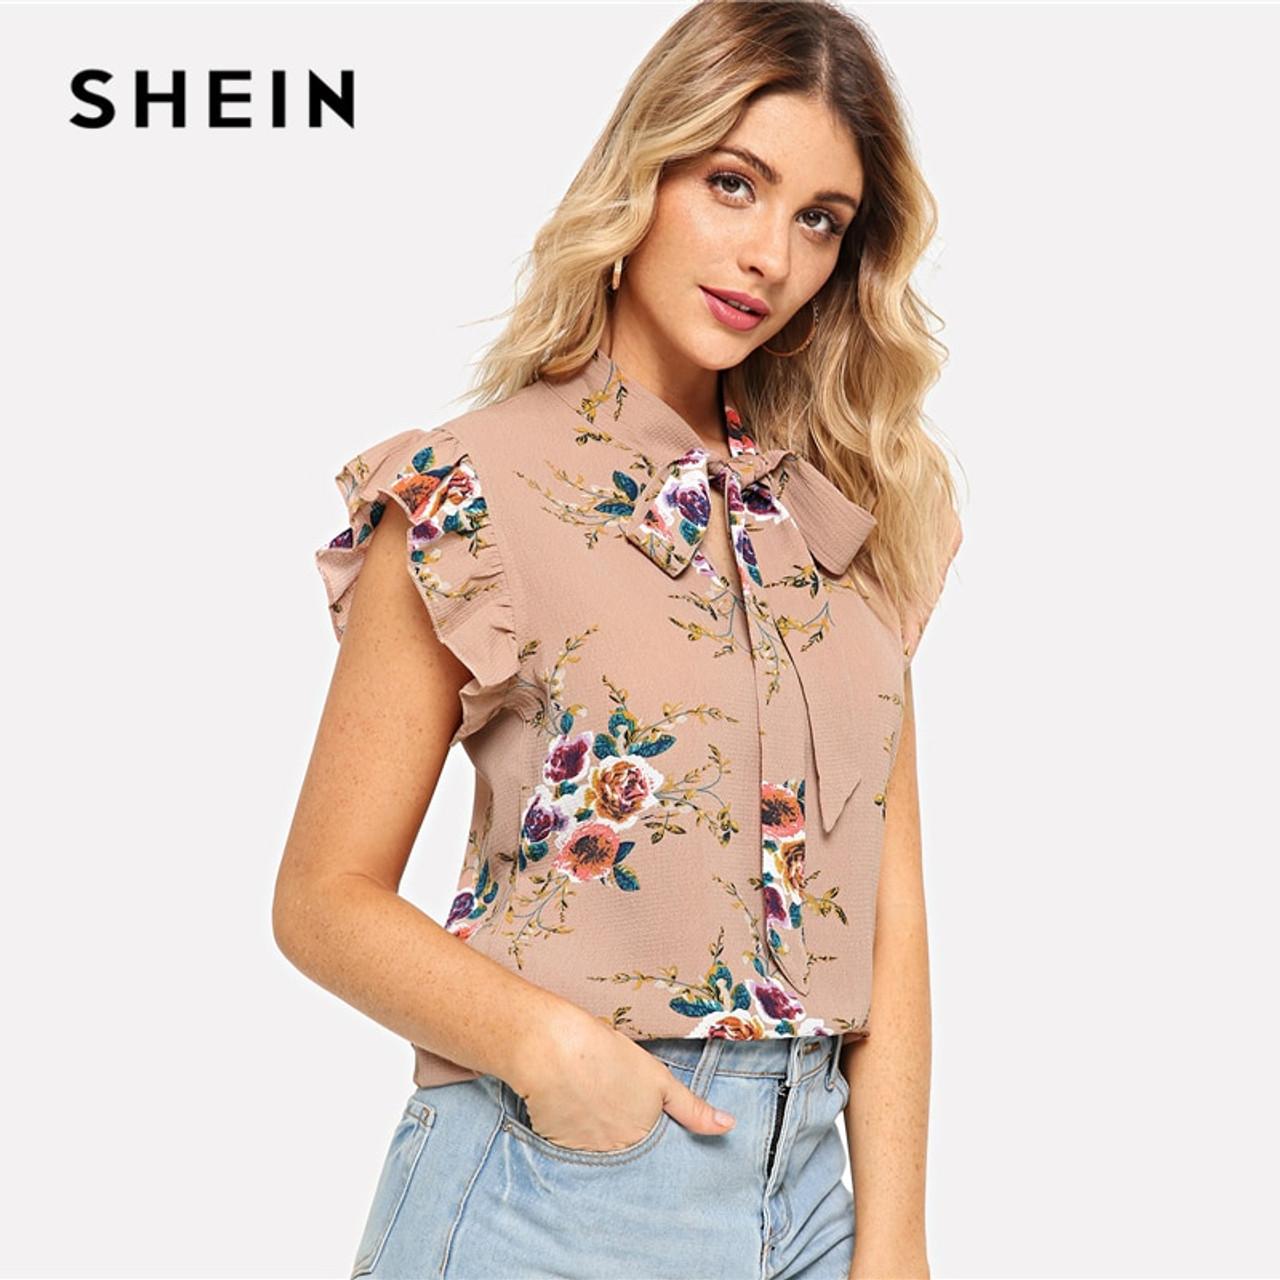 aae6b77317 ... SHEIN Flounce Shoulder Tied Neck Floral Blouse Pink Ruffle Sleeveless  Chiffon Blouses Women Summer Casual Elegant ...